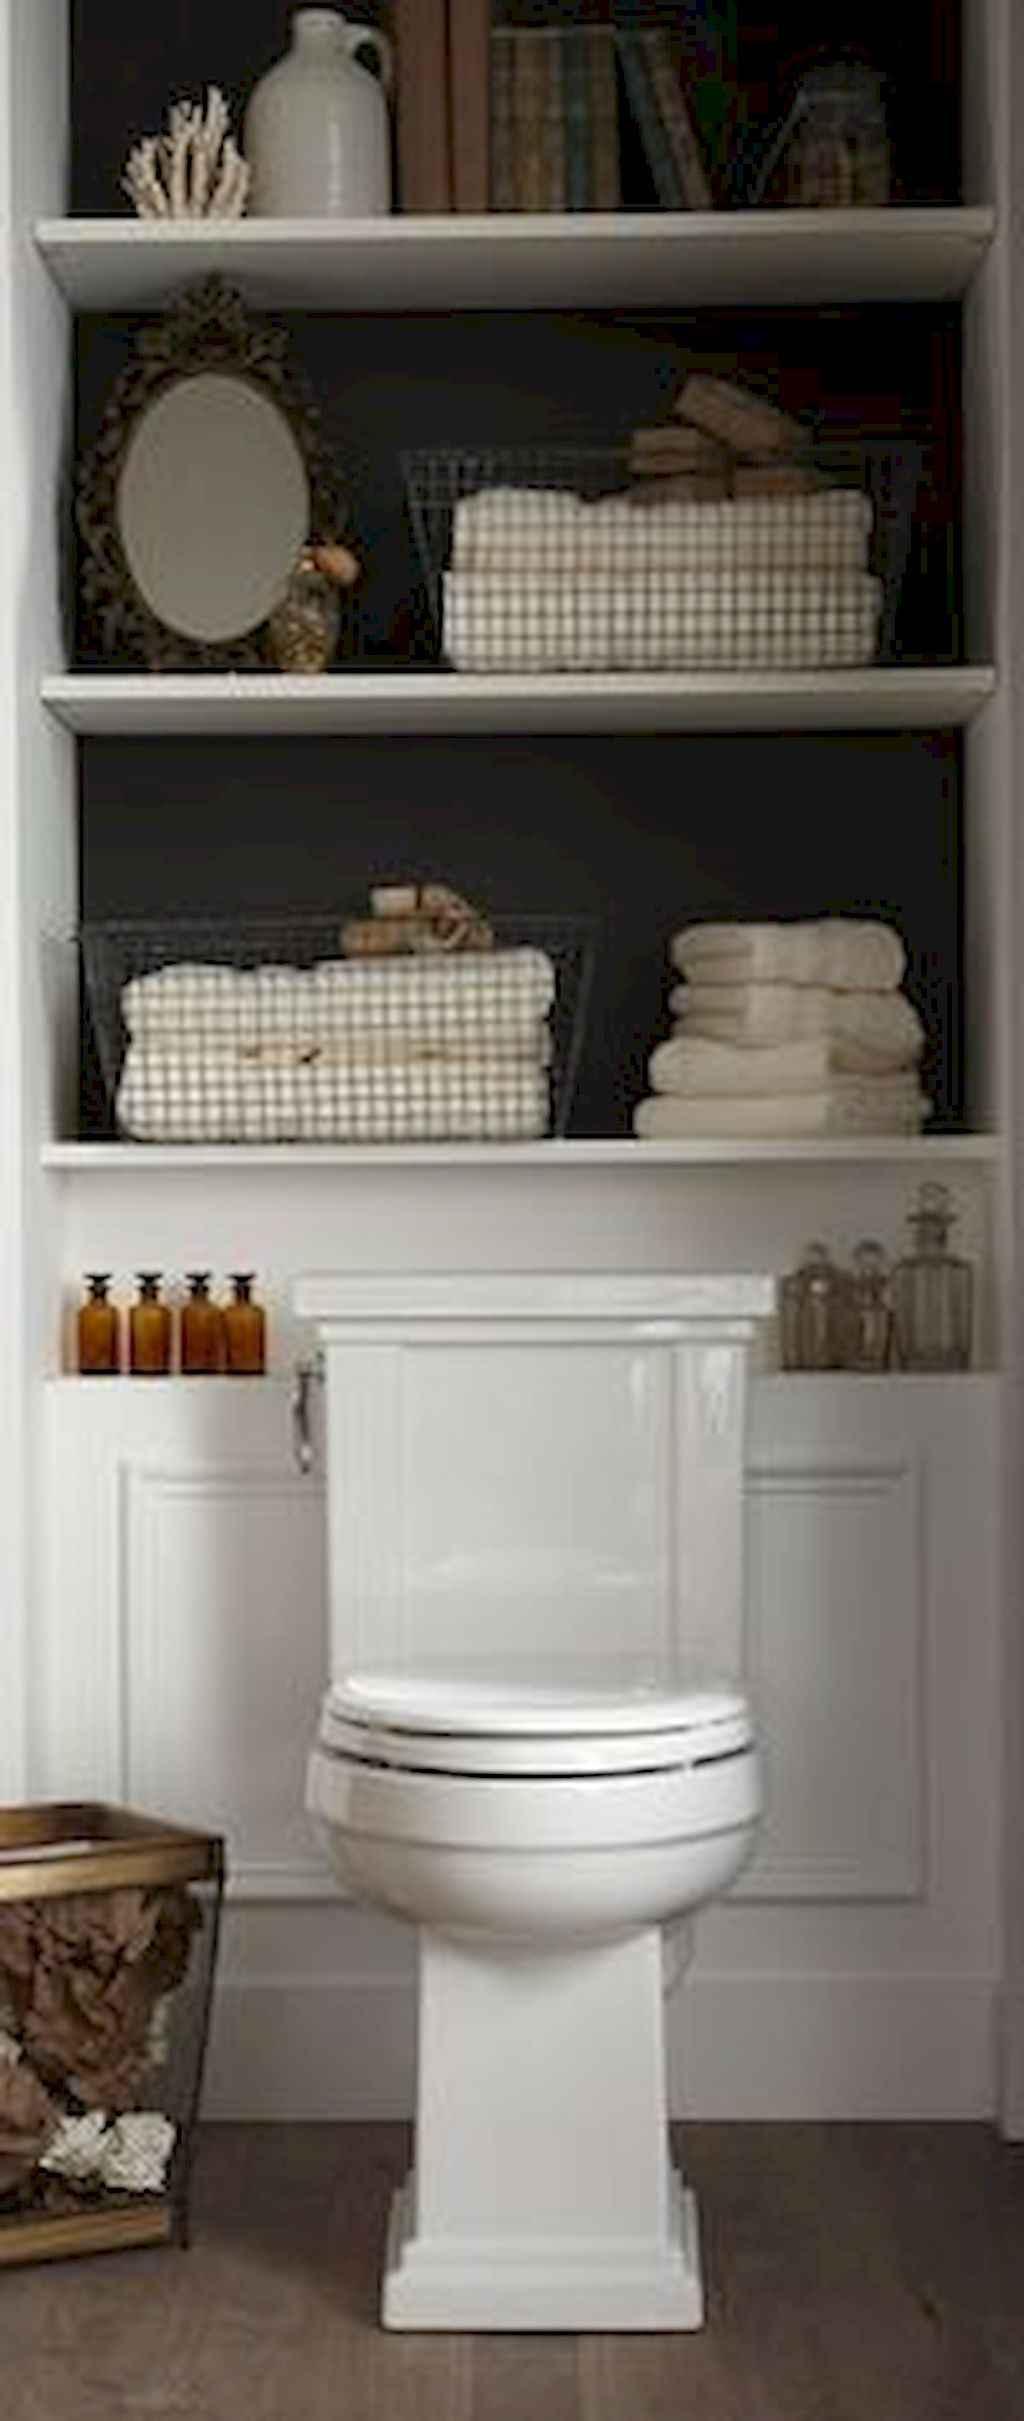 Inspiring apartment bathroom remodel ideas on a budget (38)